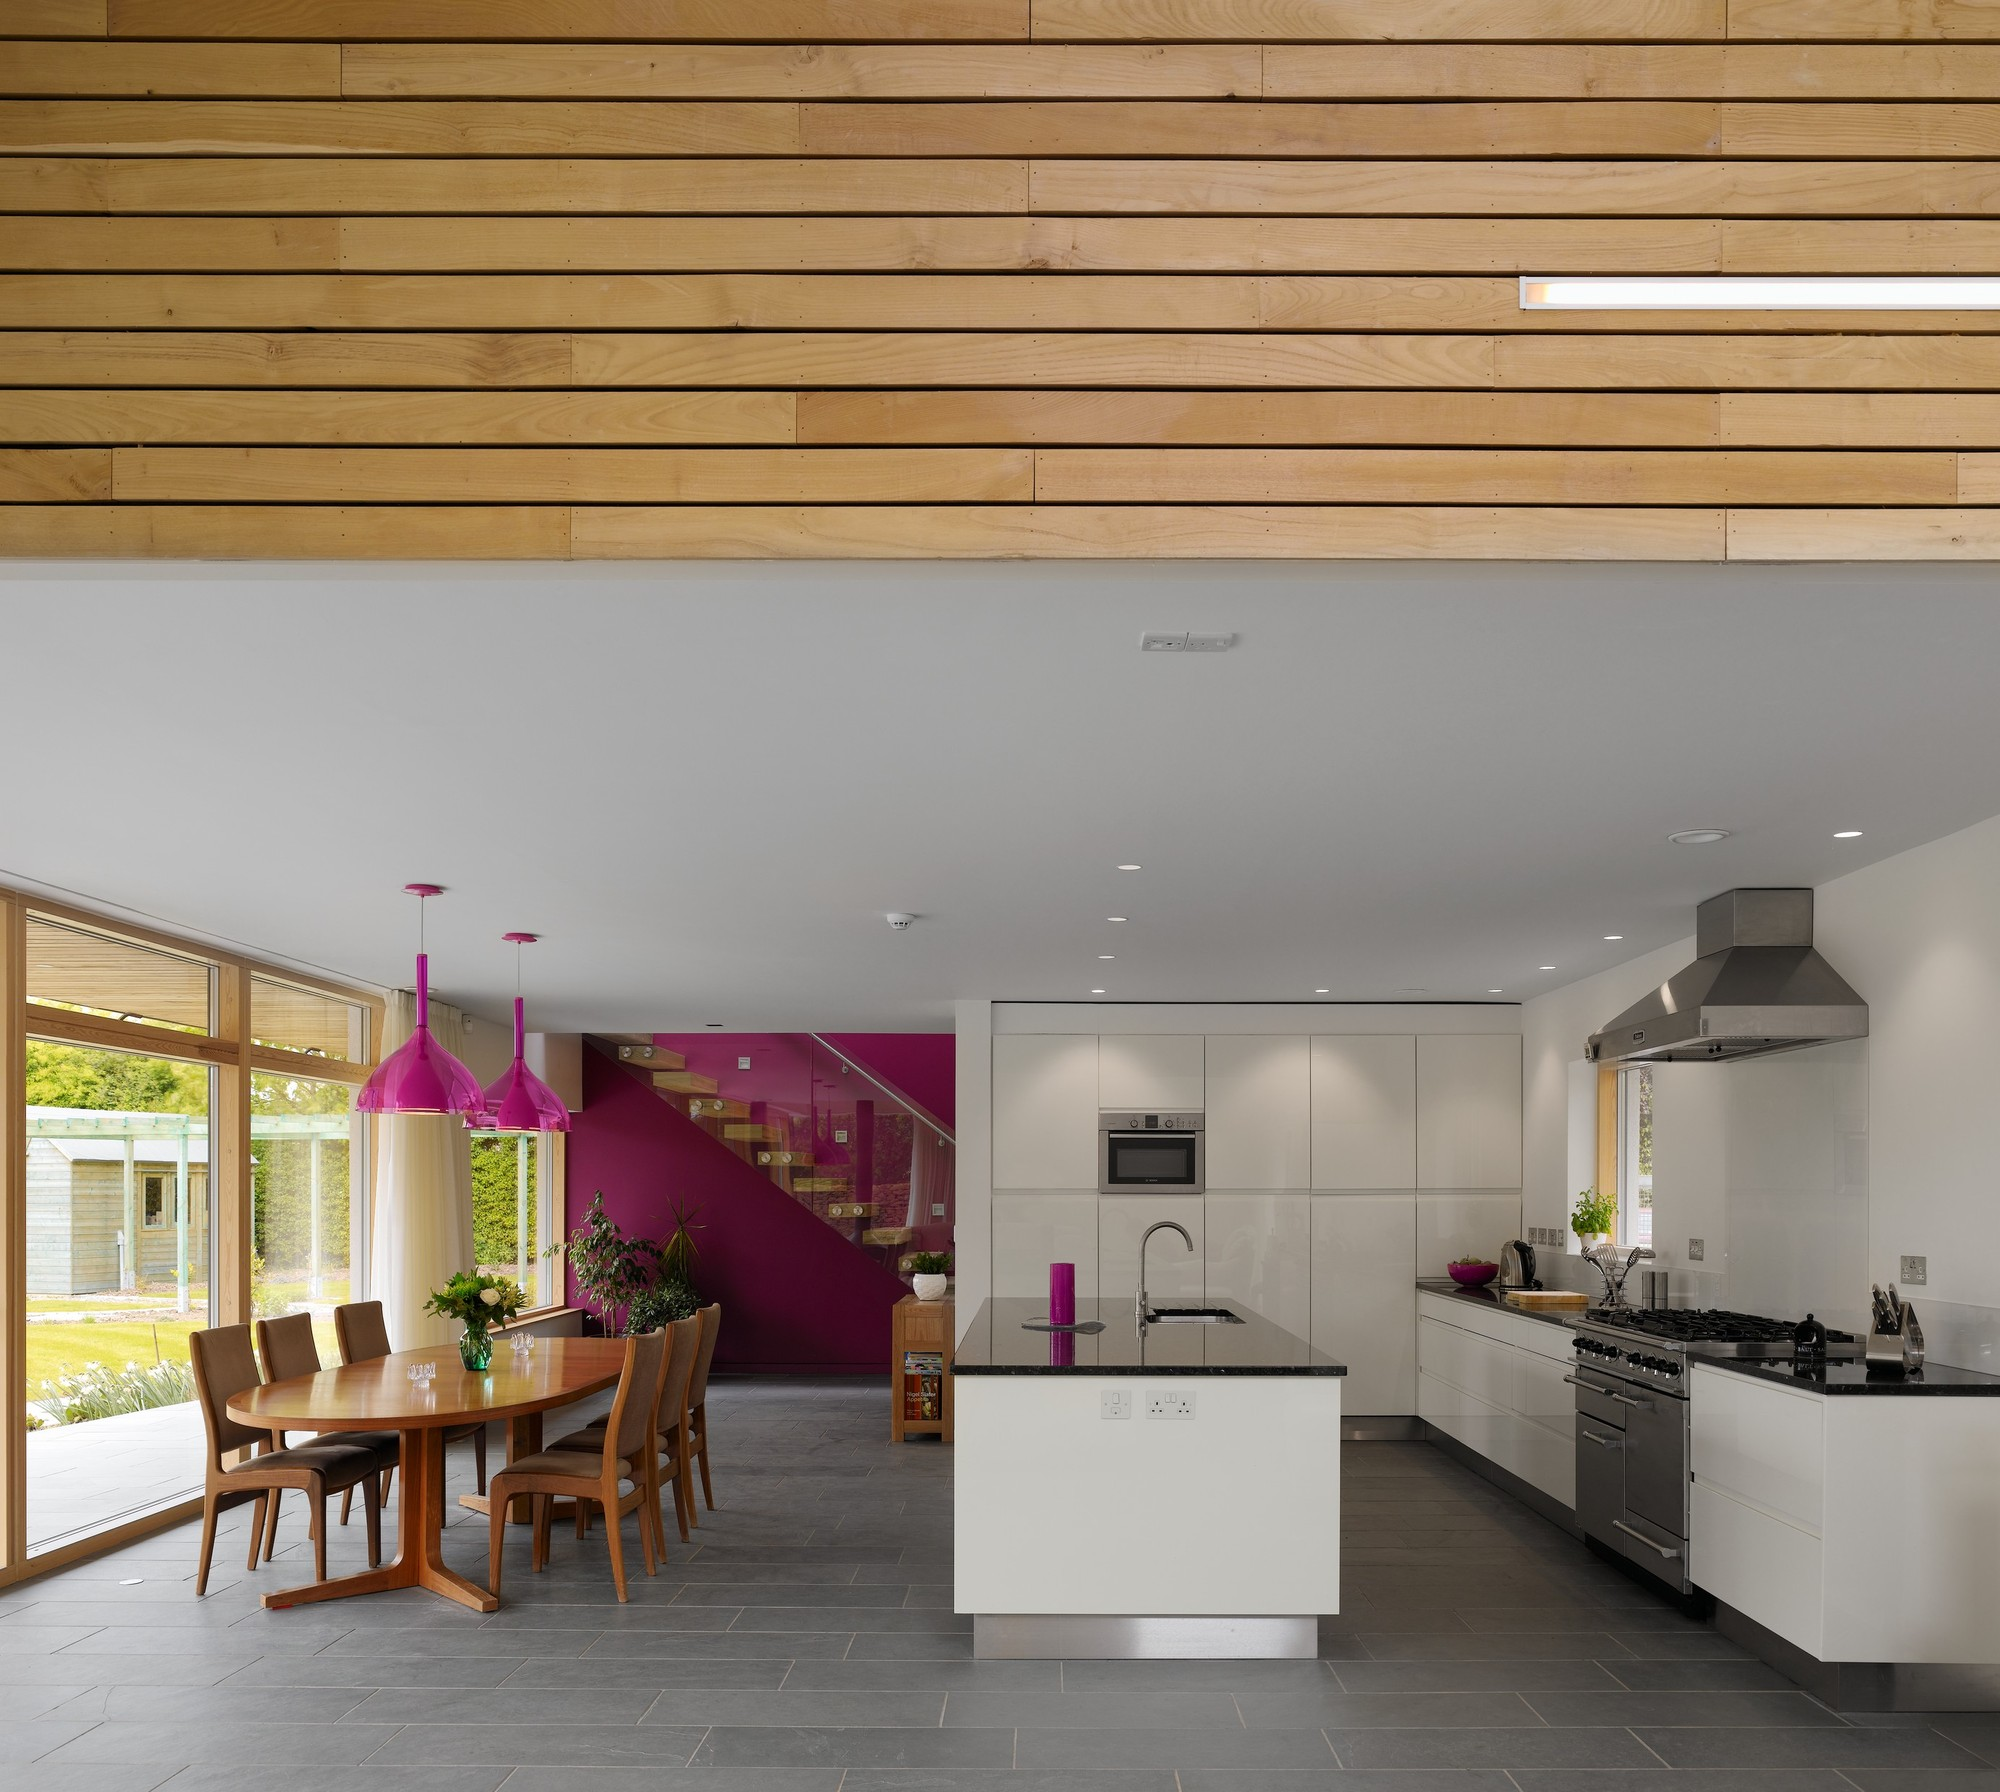 Meadowview / Platform 5 Architects